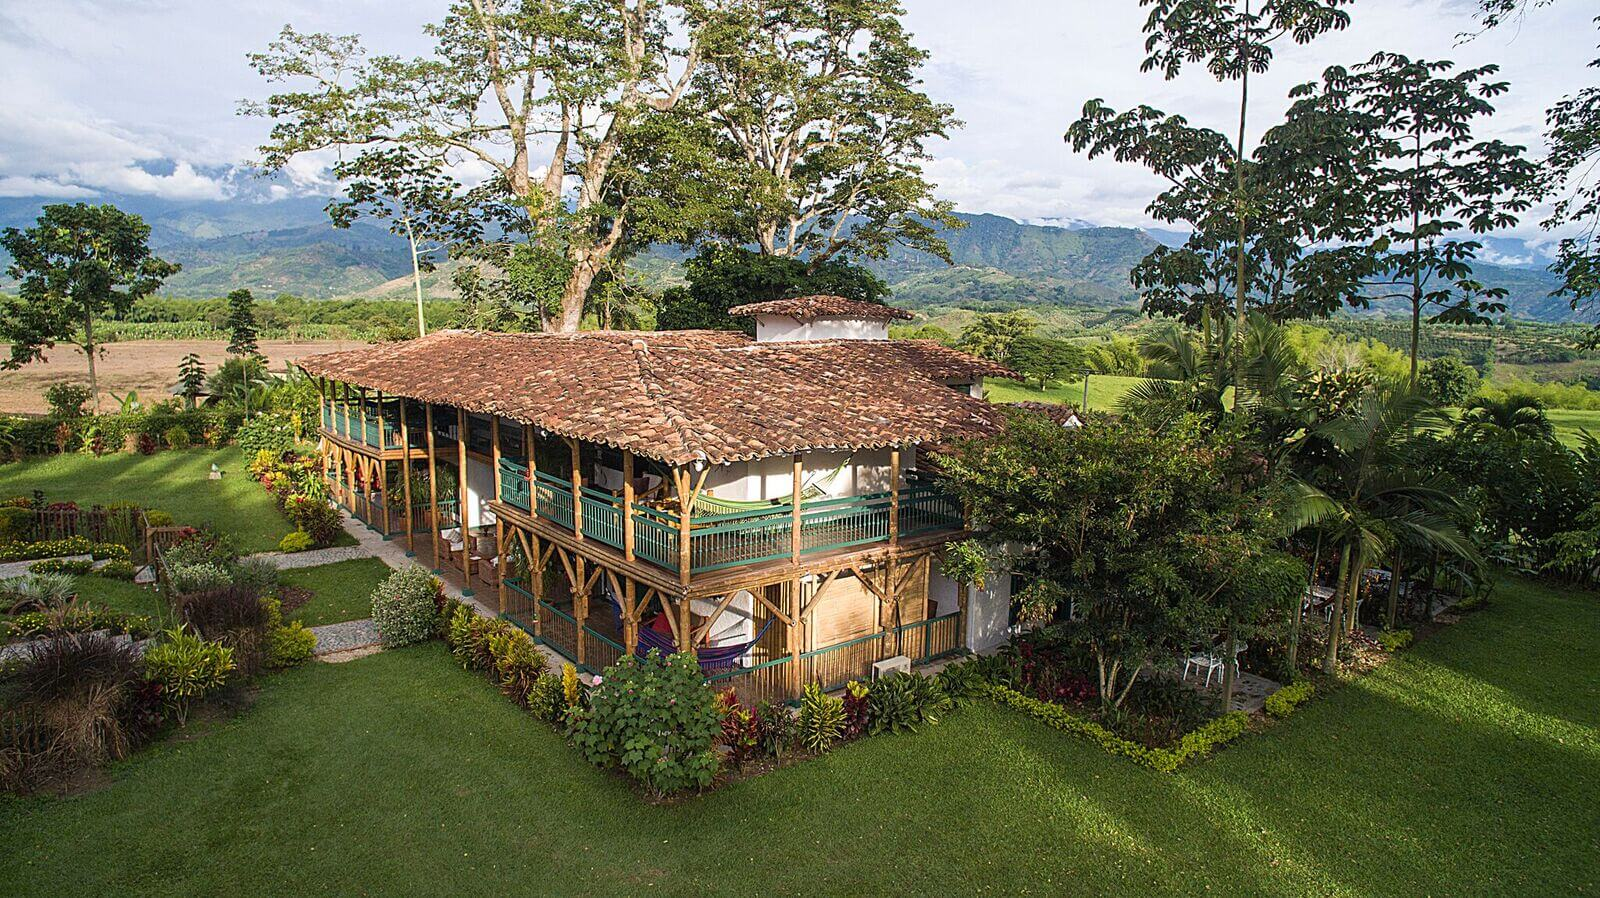 colombia, coffee region, bambusa